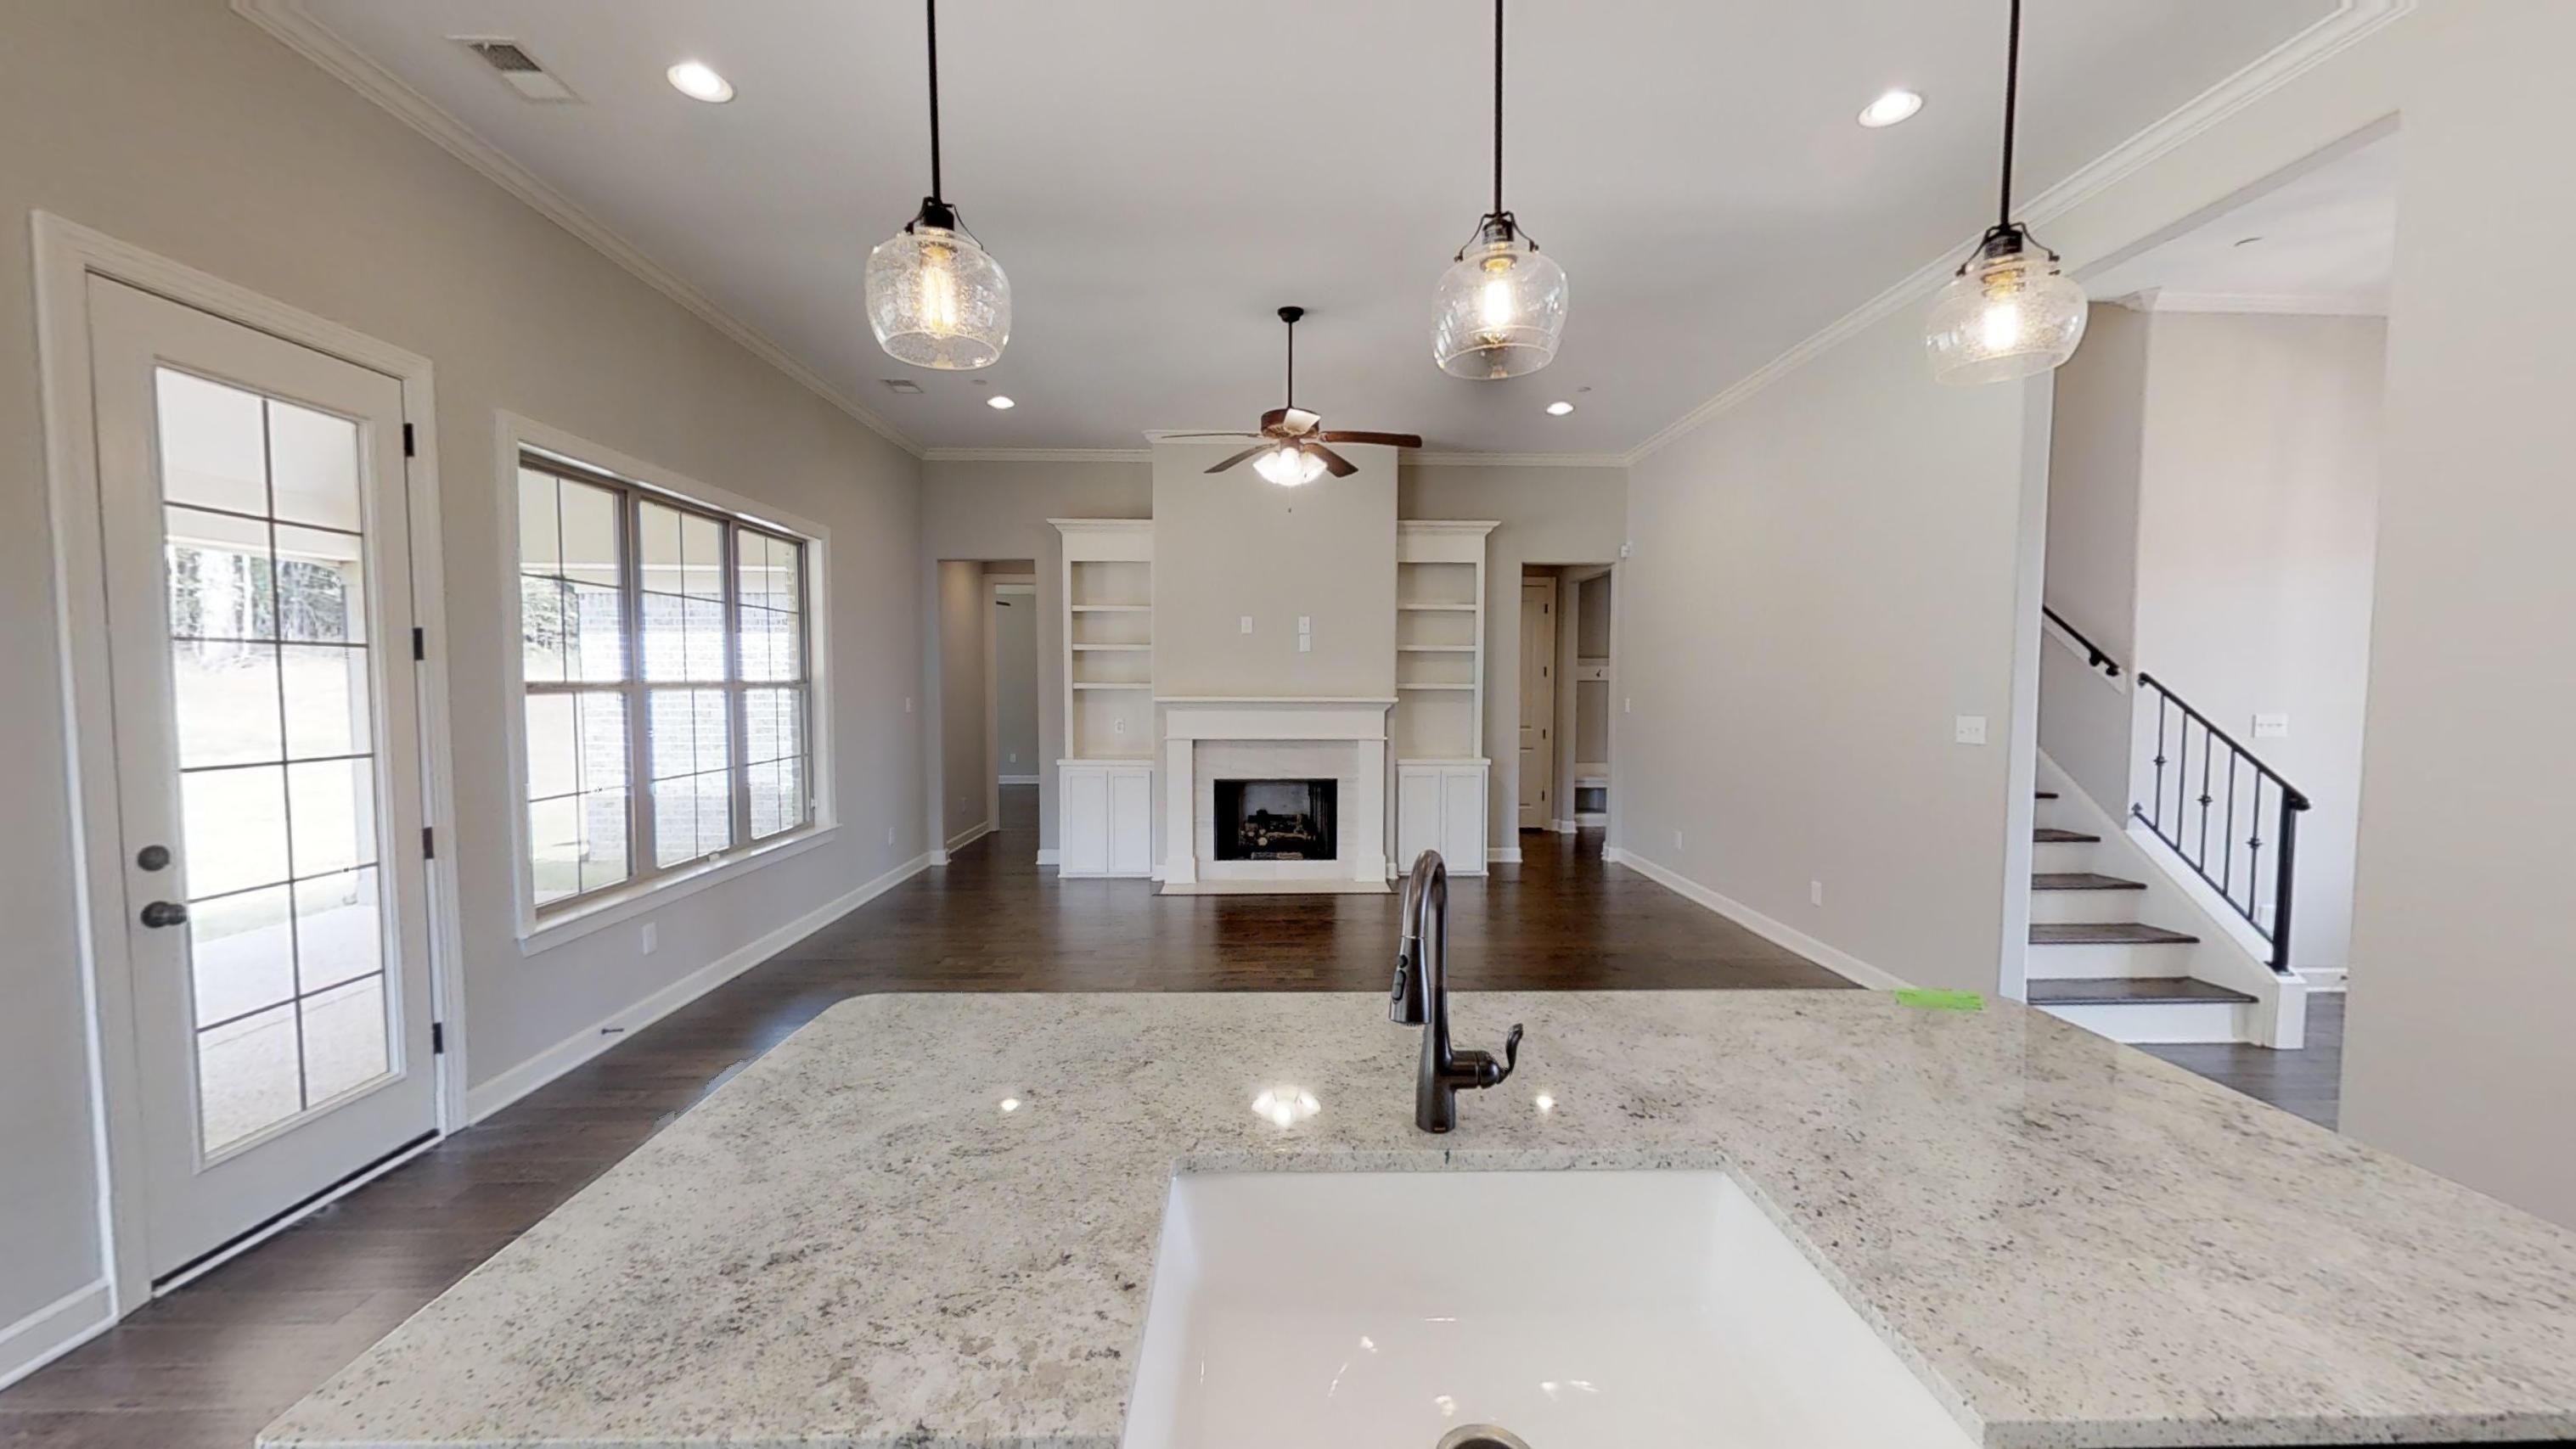 Kitchen featured in the Abbington By Regency Homebuilders in Memphis, TN